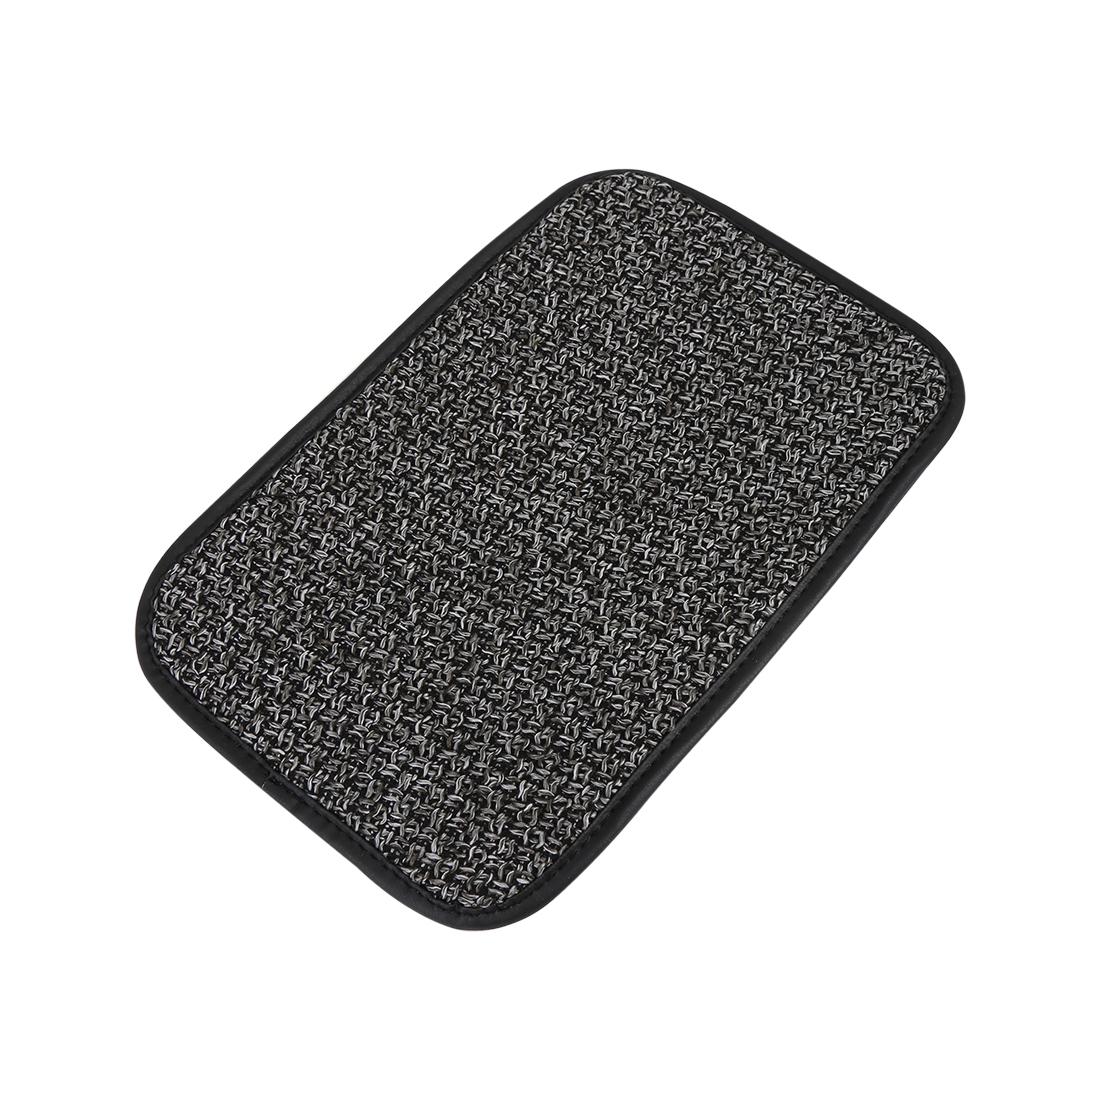 Universal Car Auto Center Console Lid Armrest Linen Cover Pad Gray